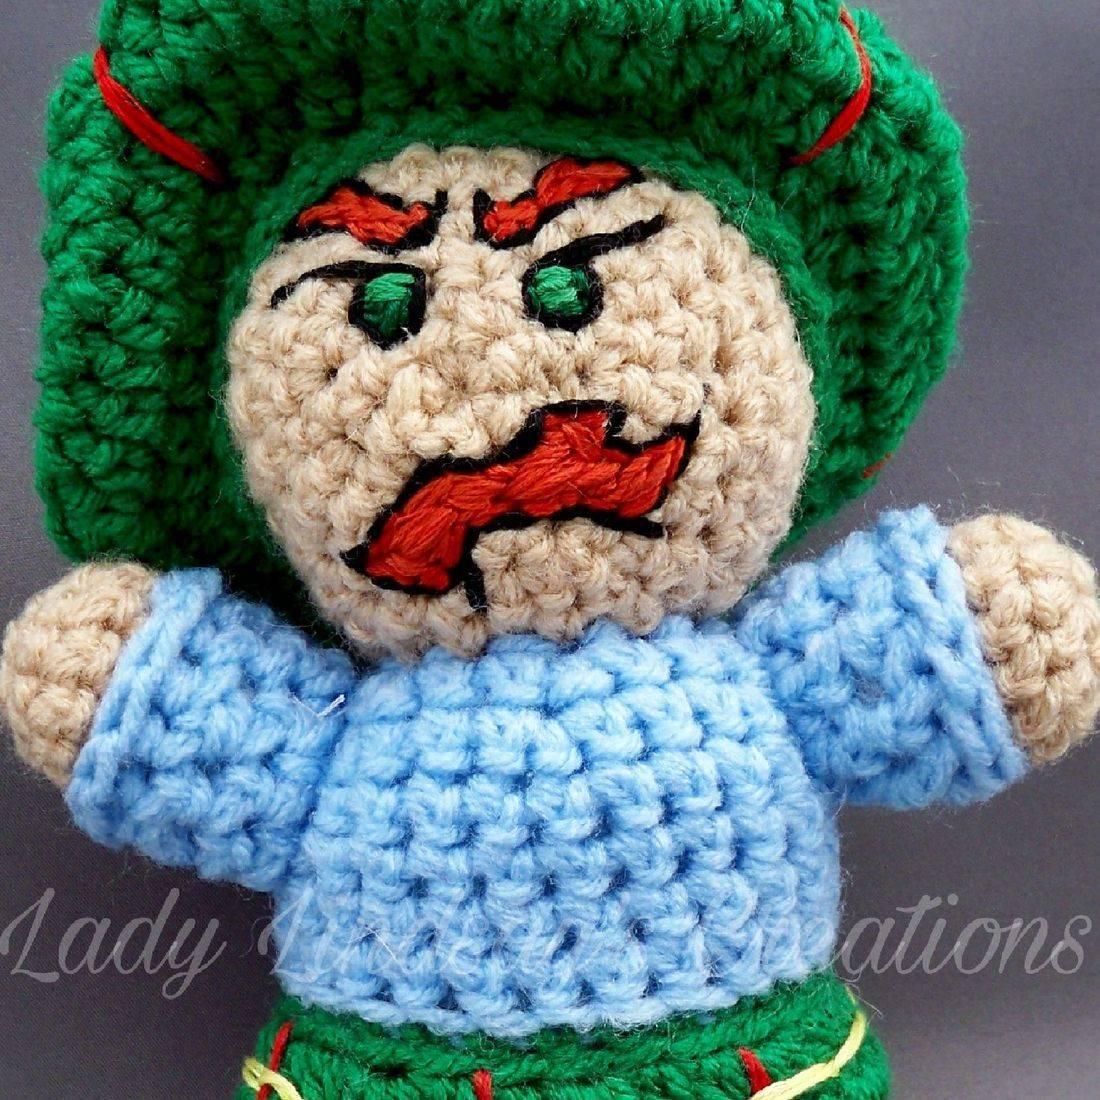 Duffy McTaggert, Commission, Custom, Crochet, Amigurumi, Plush, Doll, Handmade, handcrafted, craft, artisan, art, paint, Shop Small, Disney, nerd, geek, otaku, manga